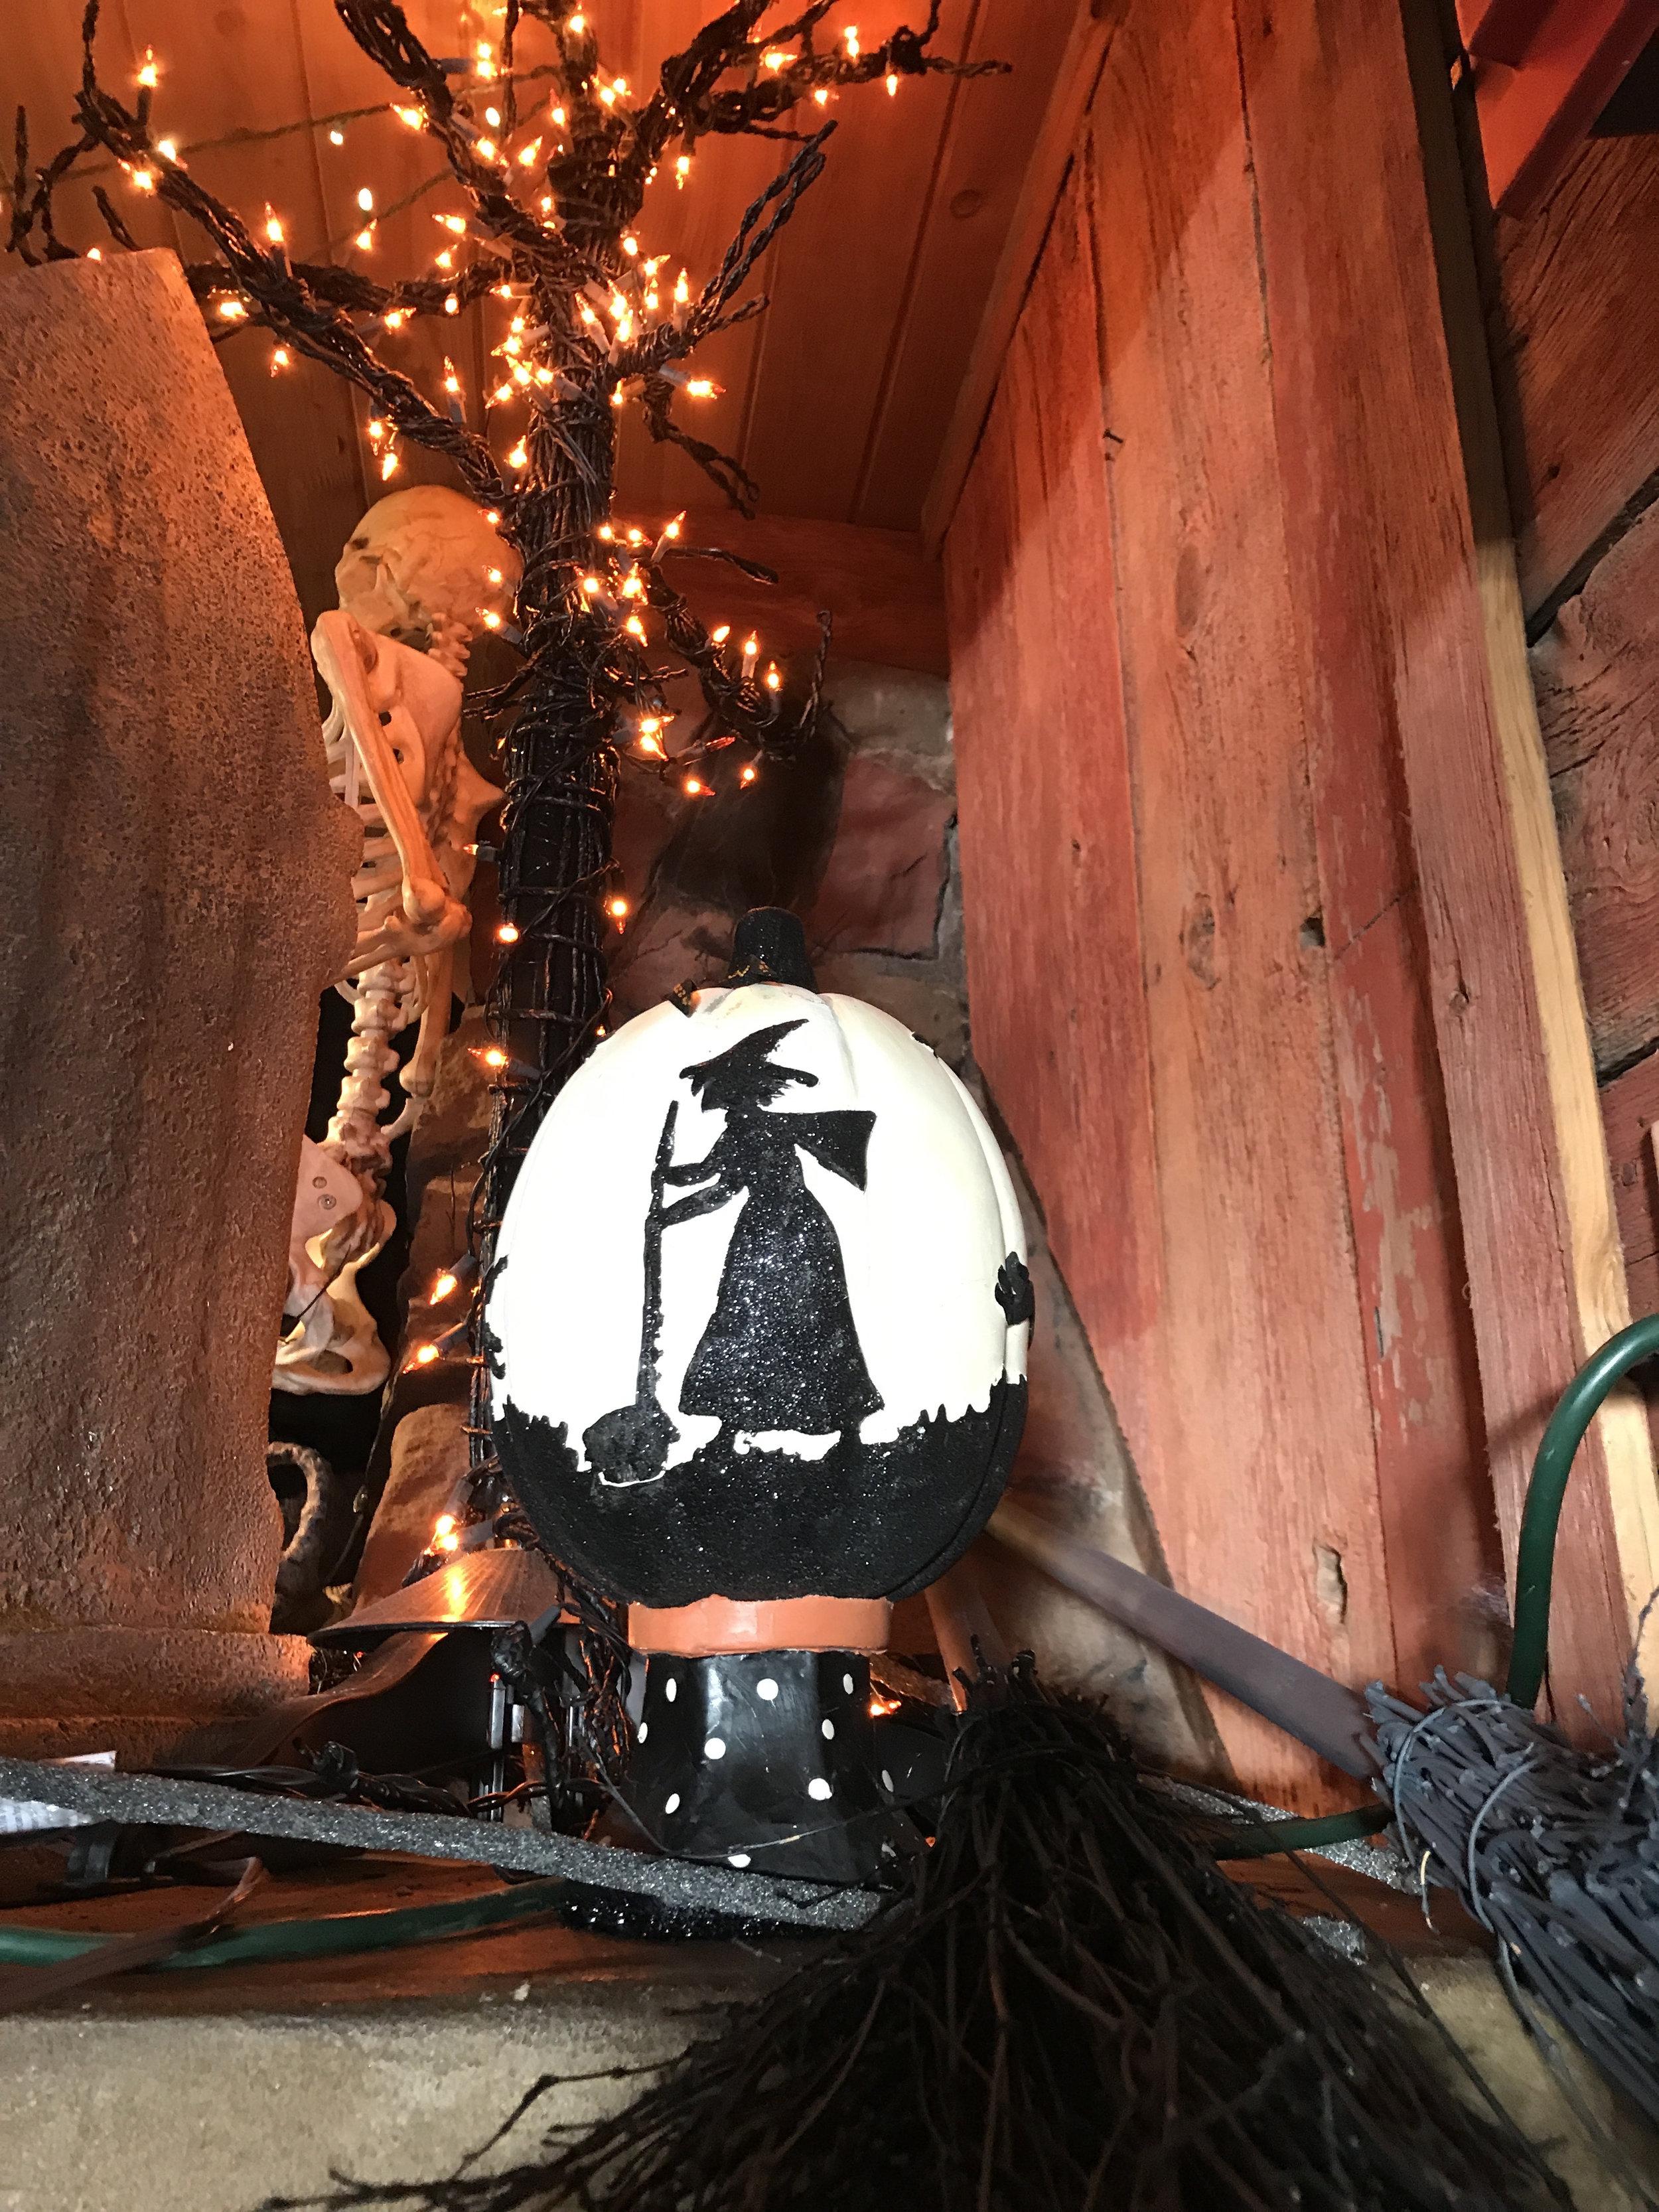 teri_w3bookclub_Wicked_halloween_spiritedtable_photo33.jpg